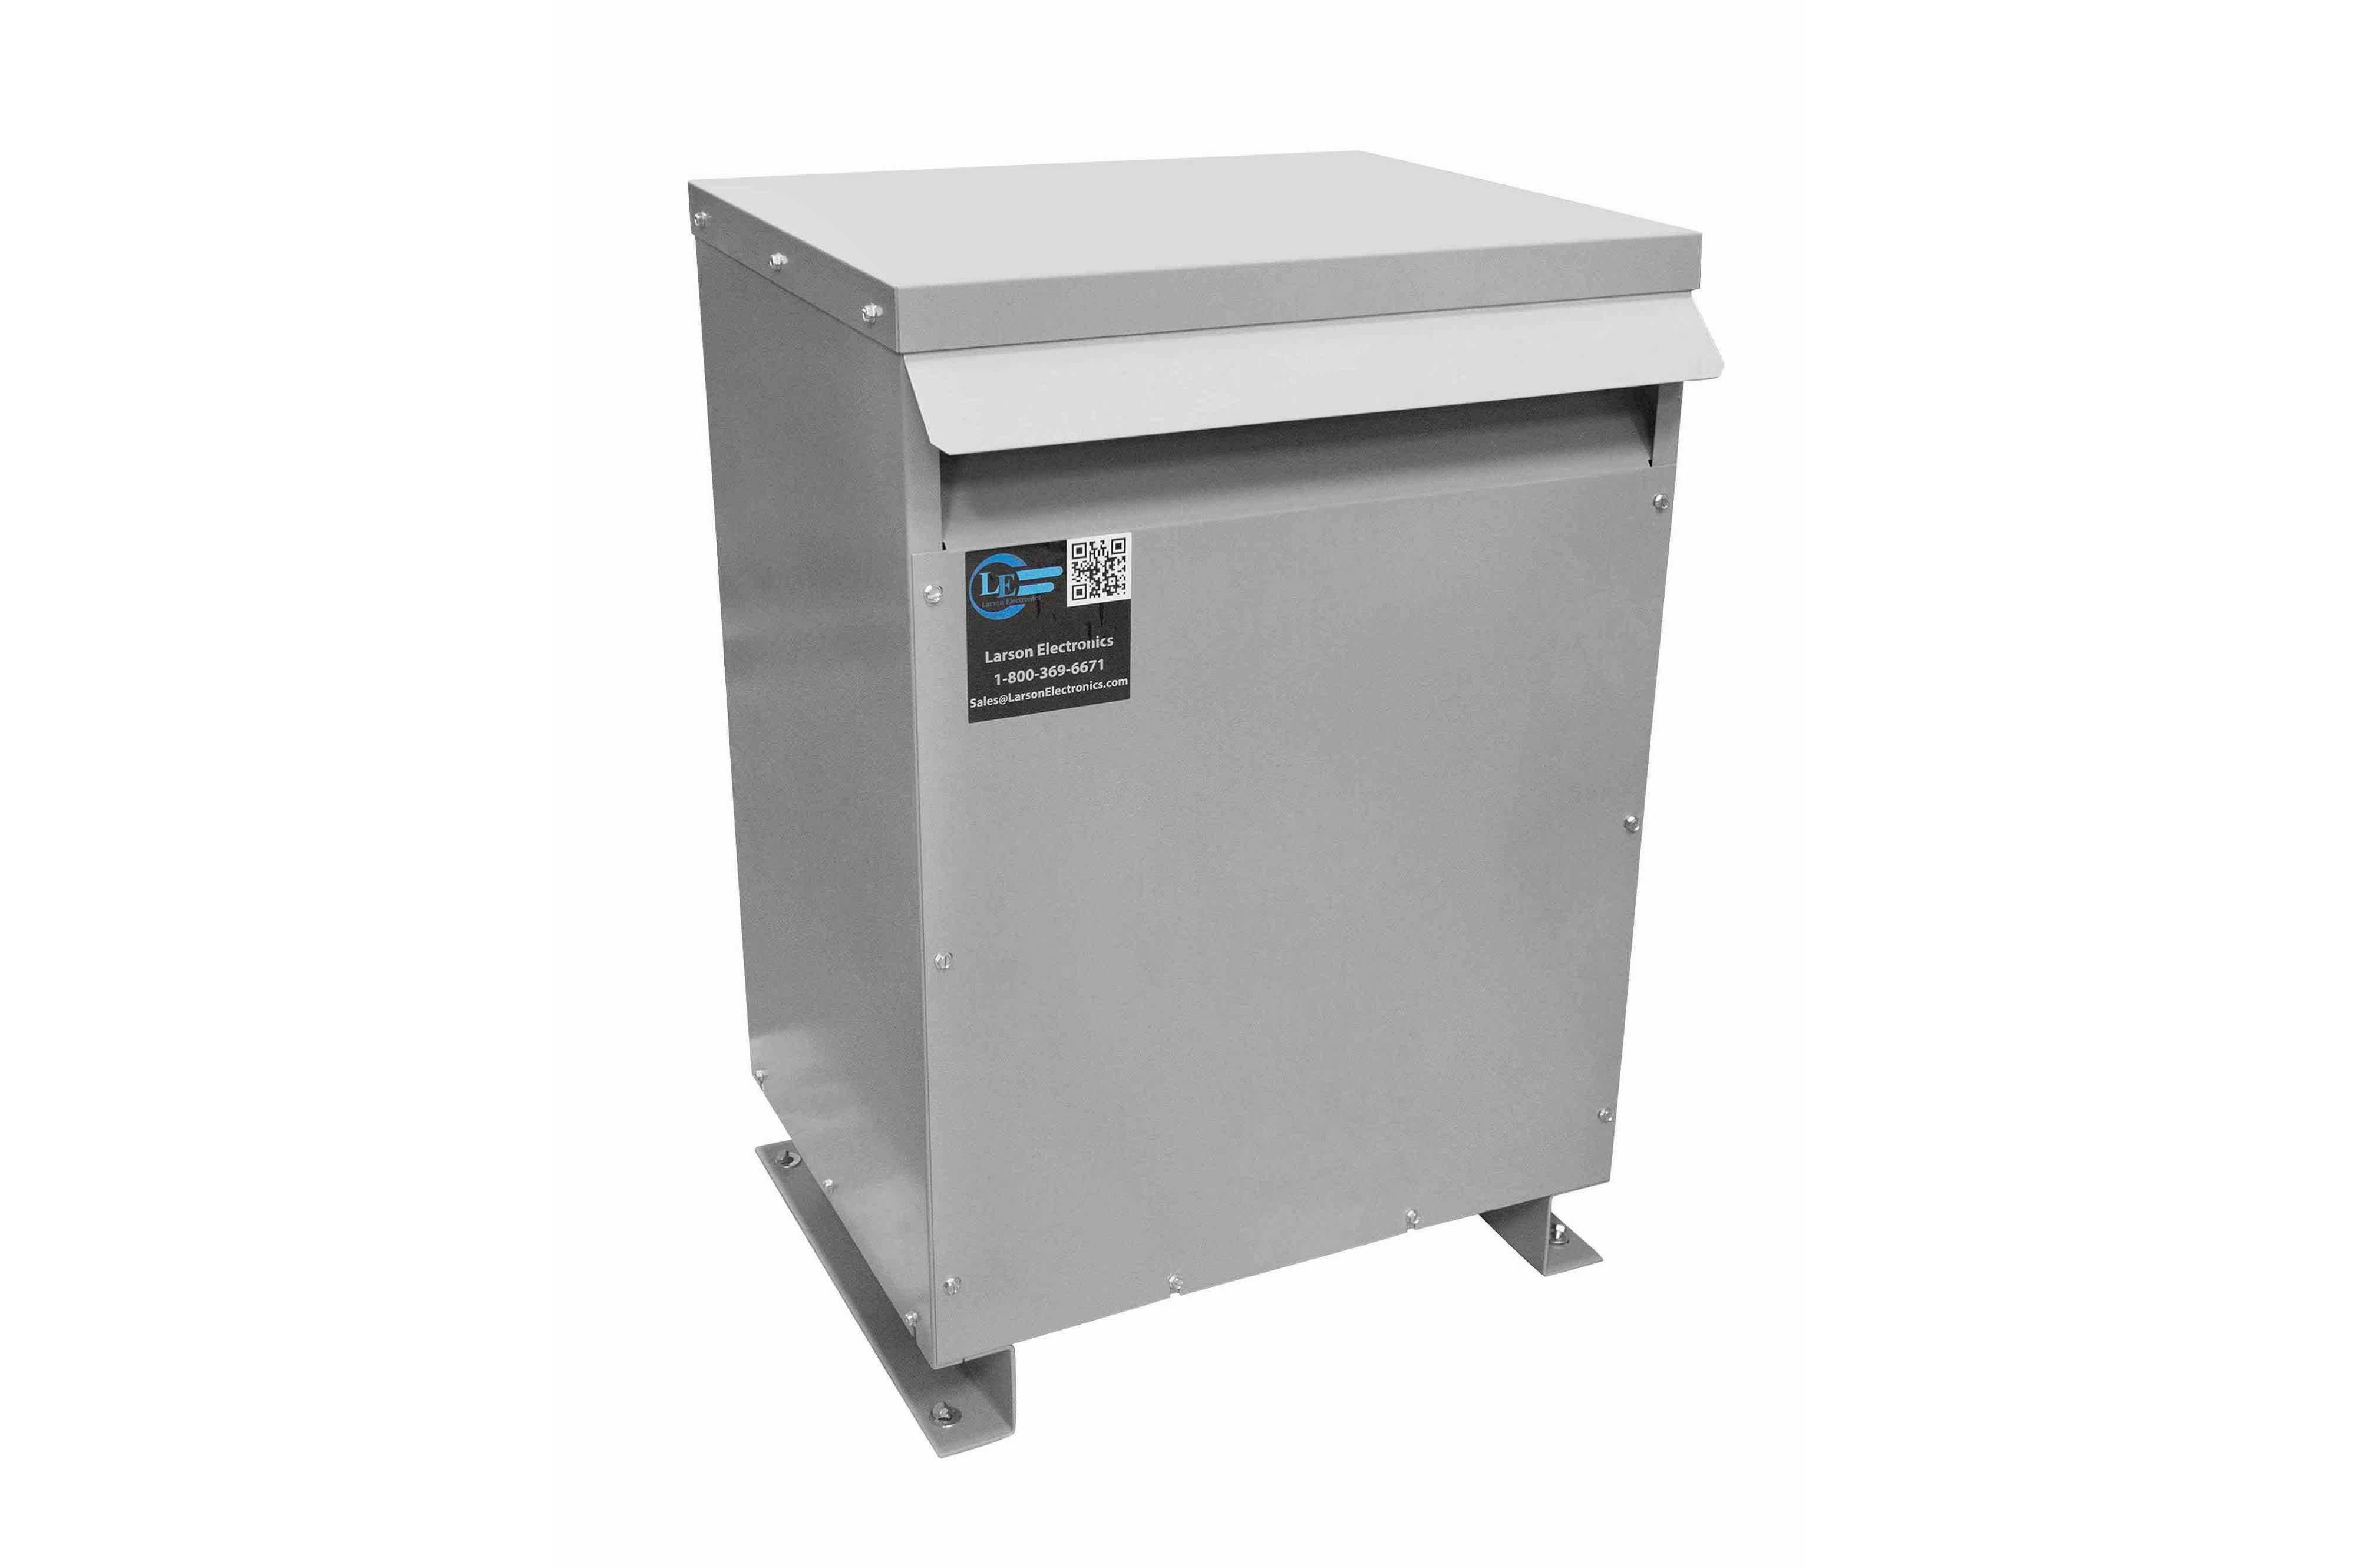 10 kVA 3PH Isolation Transformer, 440V Wye Primary, 240V Delta Secondary, N3R, Ventilated, 60 Hz